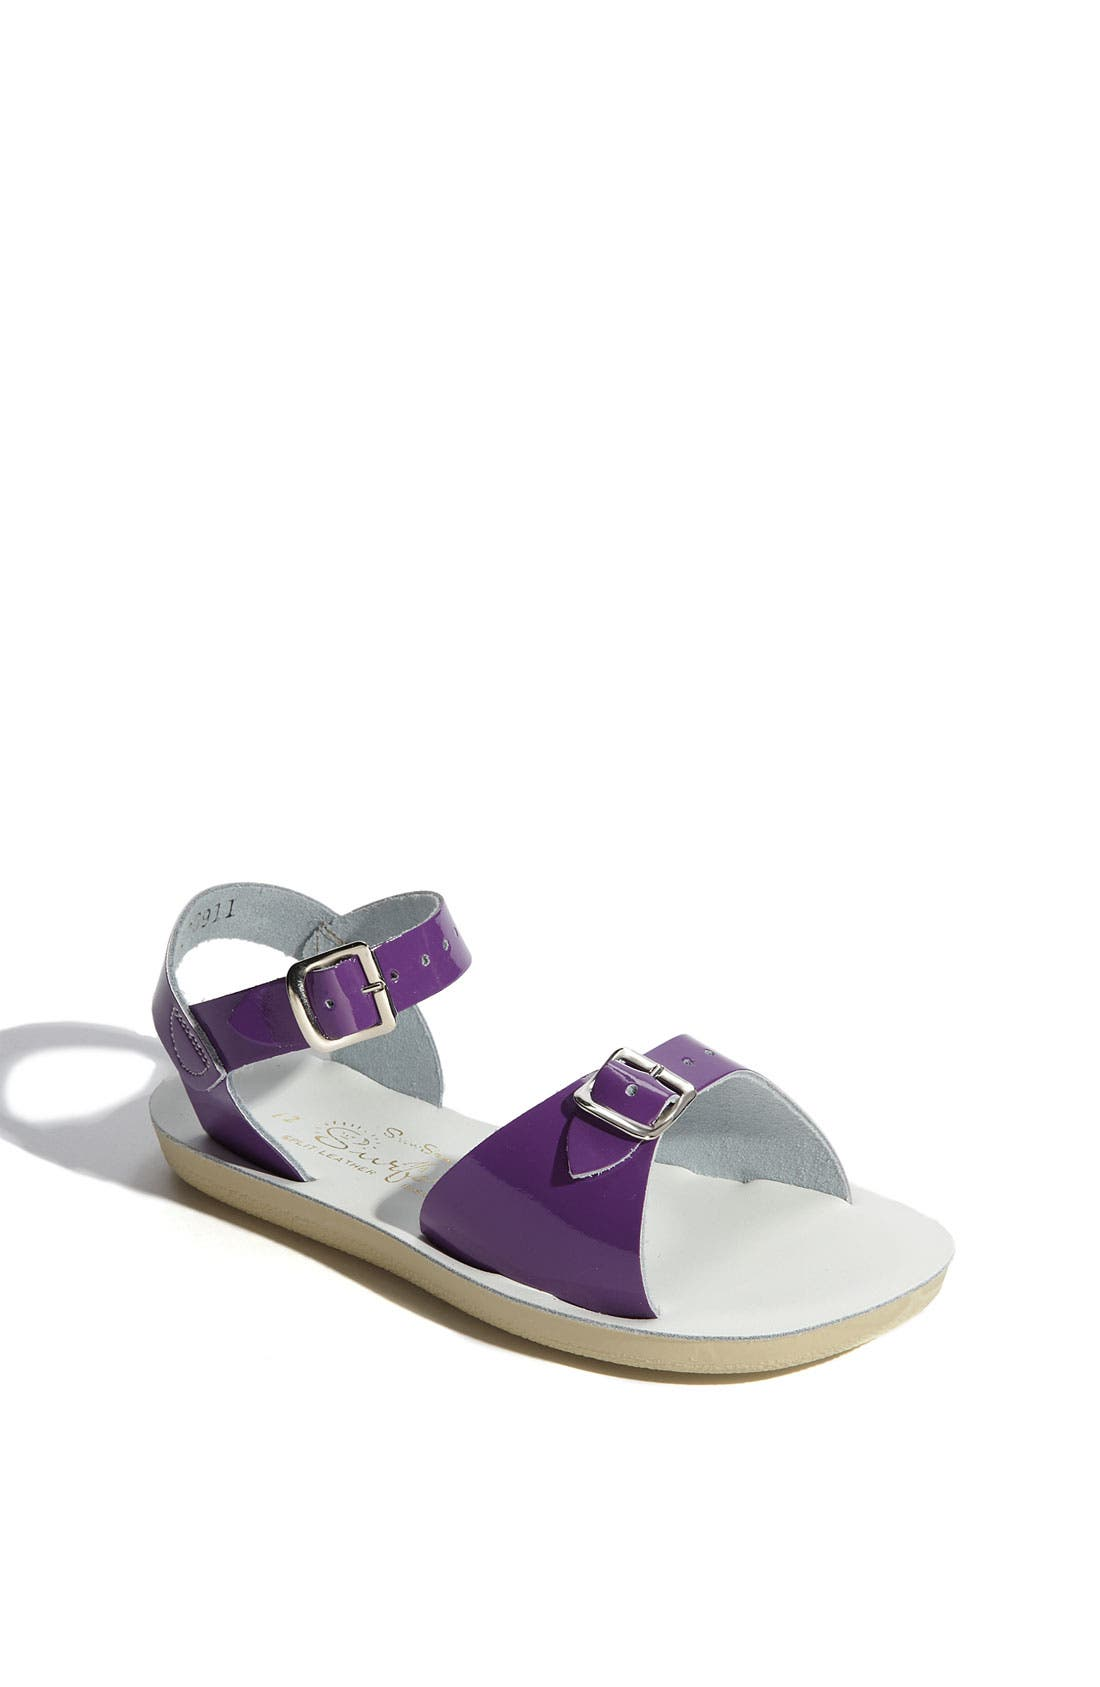 'Surfer' Sandal,                         Main,                         color, SHINY PURPLE